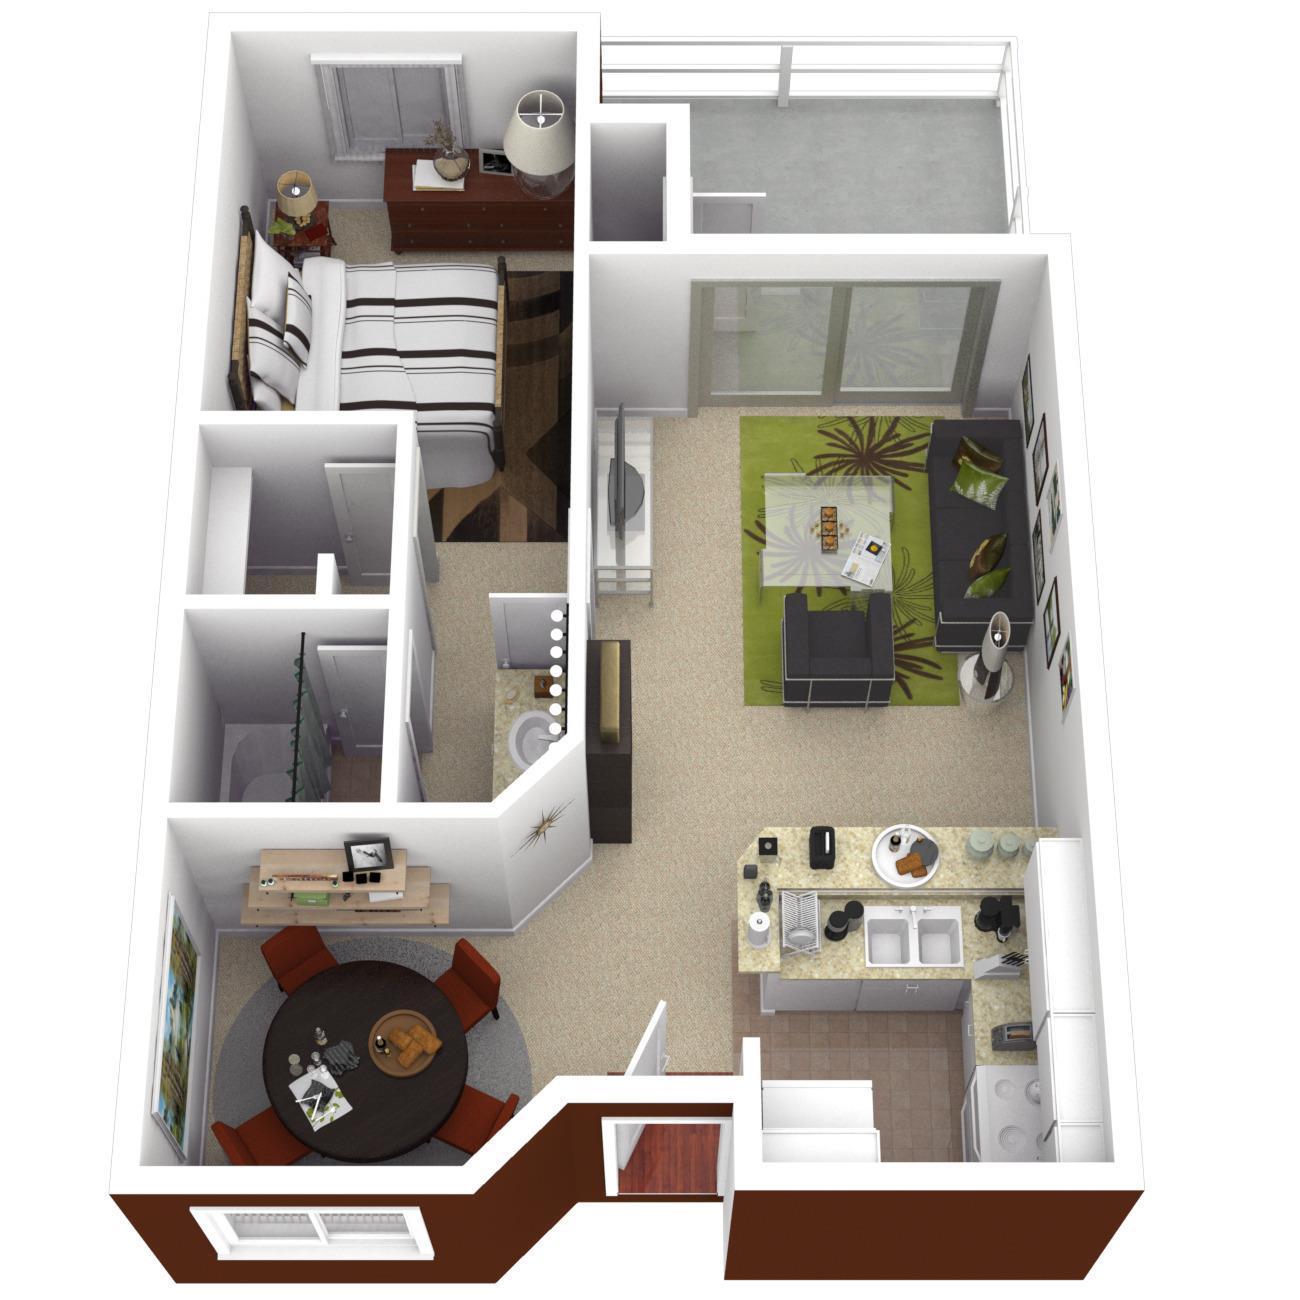 Apartments In Costa Mesa: Camden Martinique, Costa Mesa CA